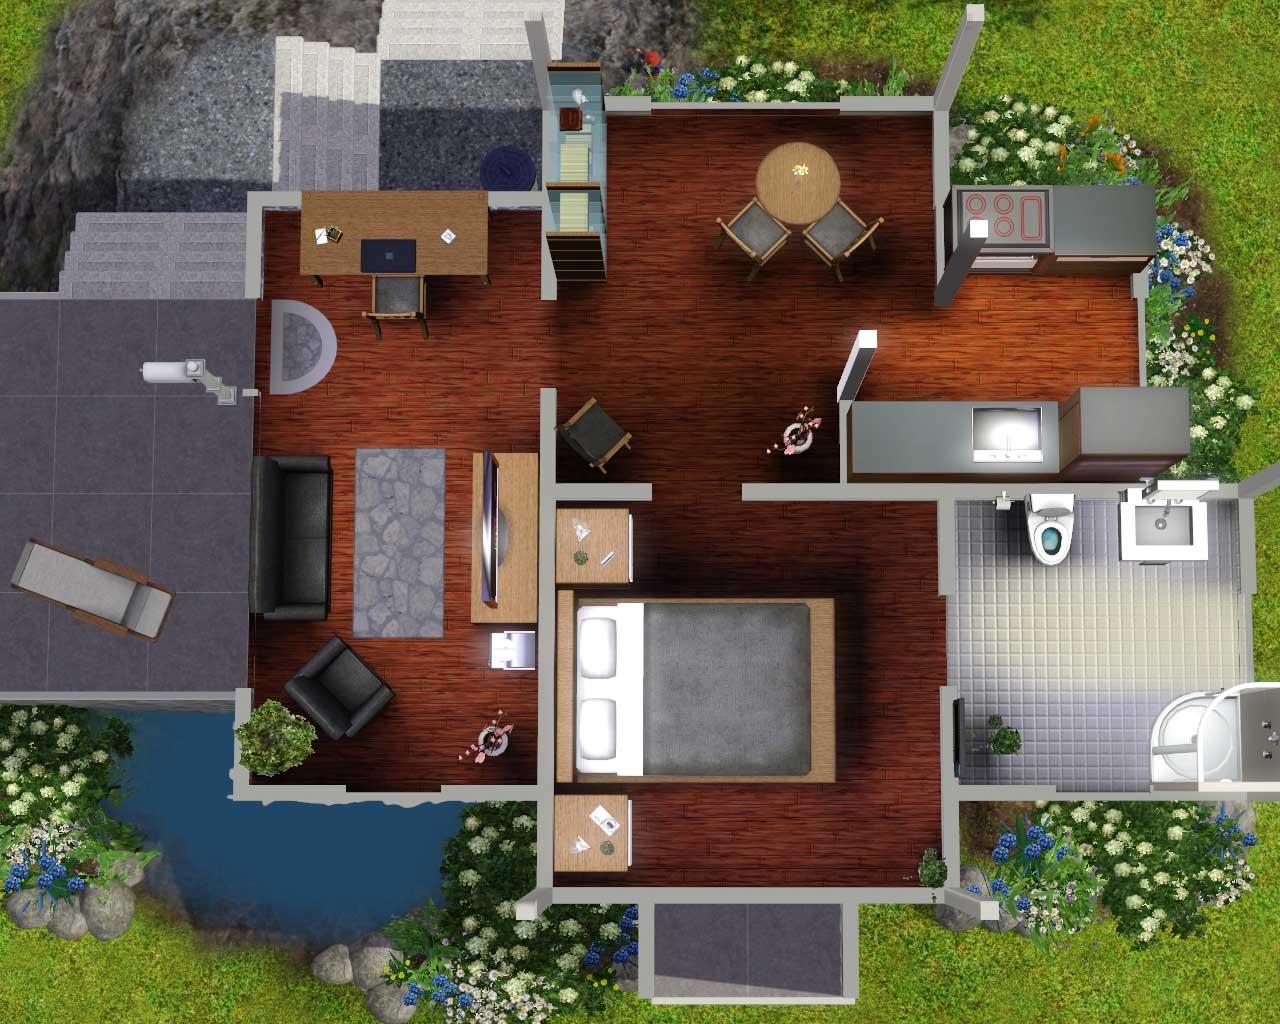 Bachelor Pads House Plans House Interior